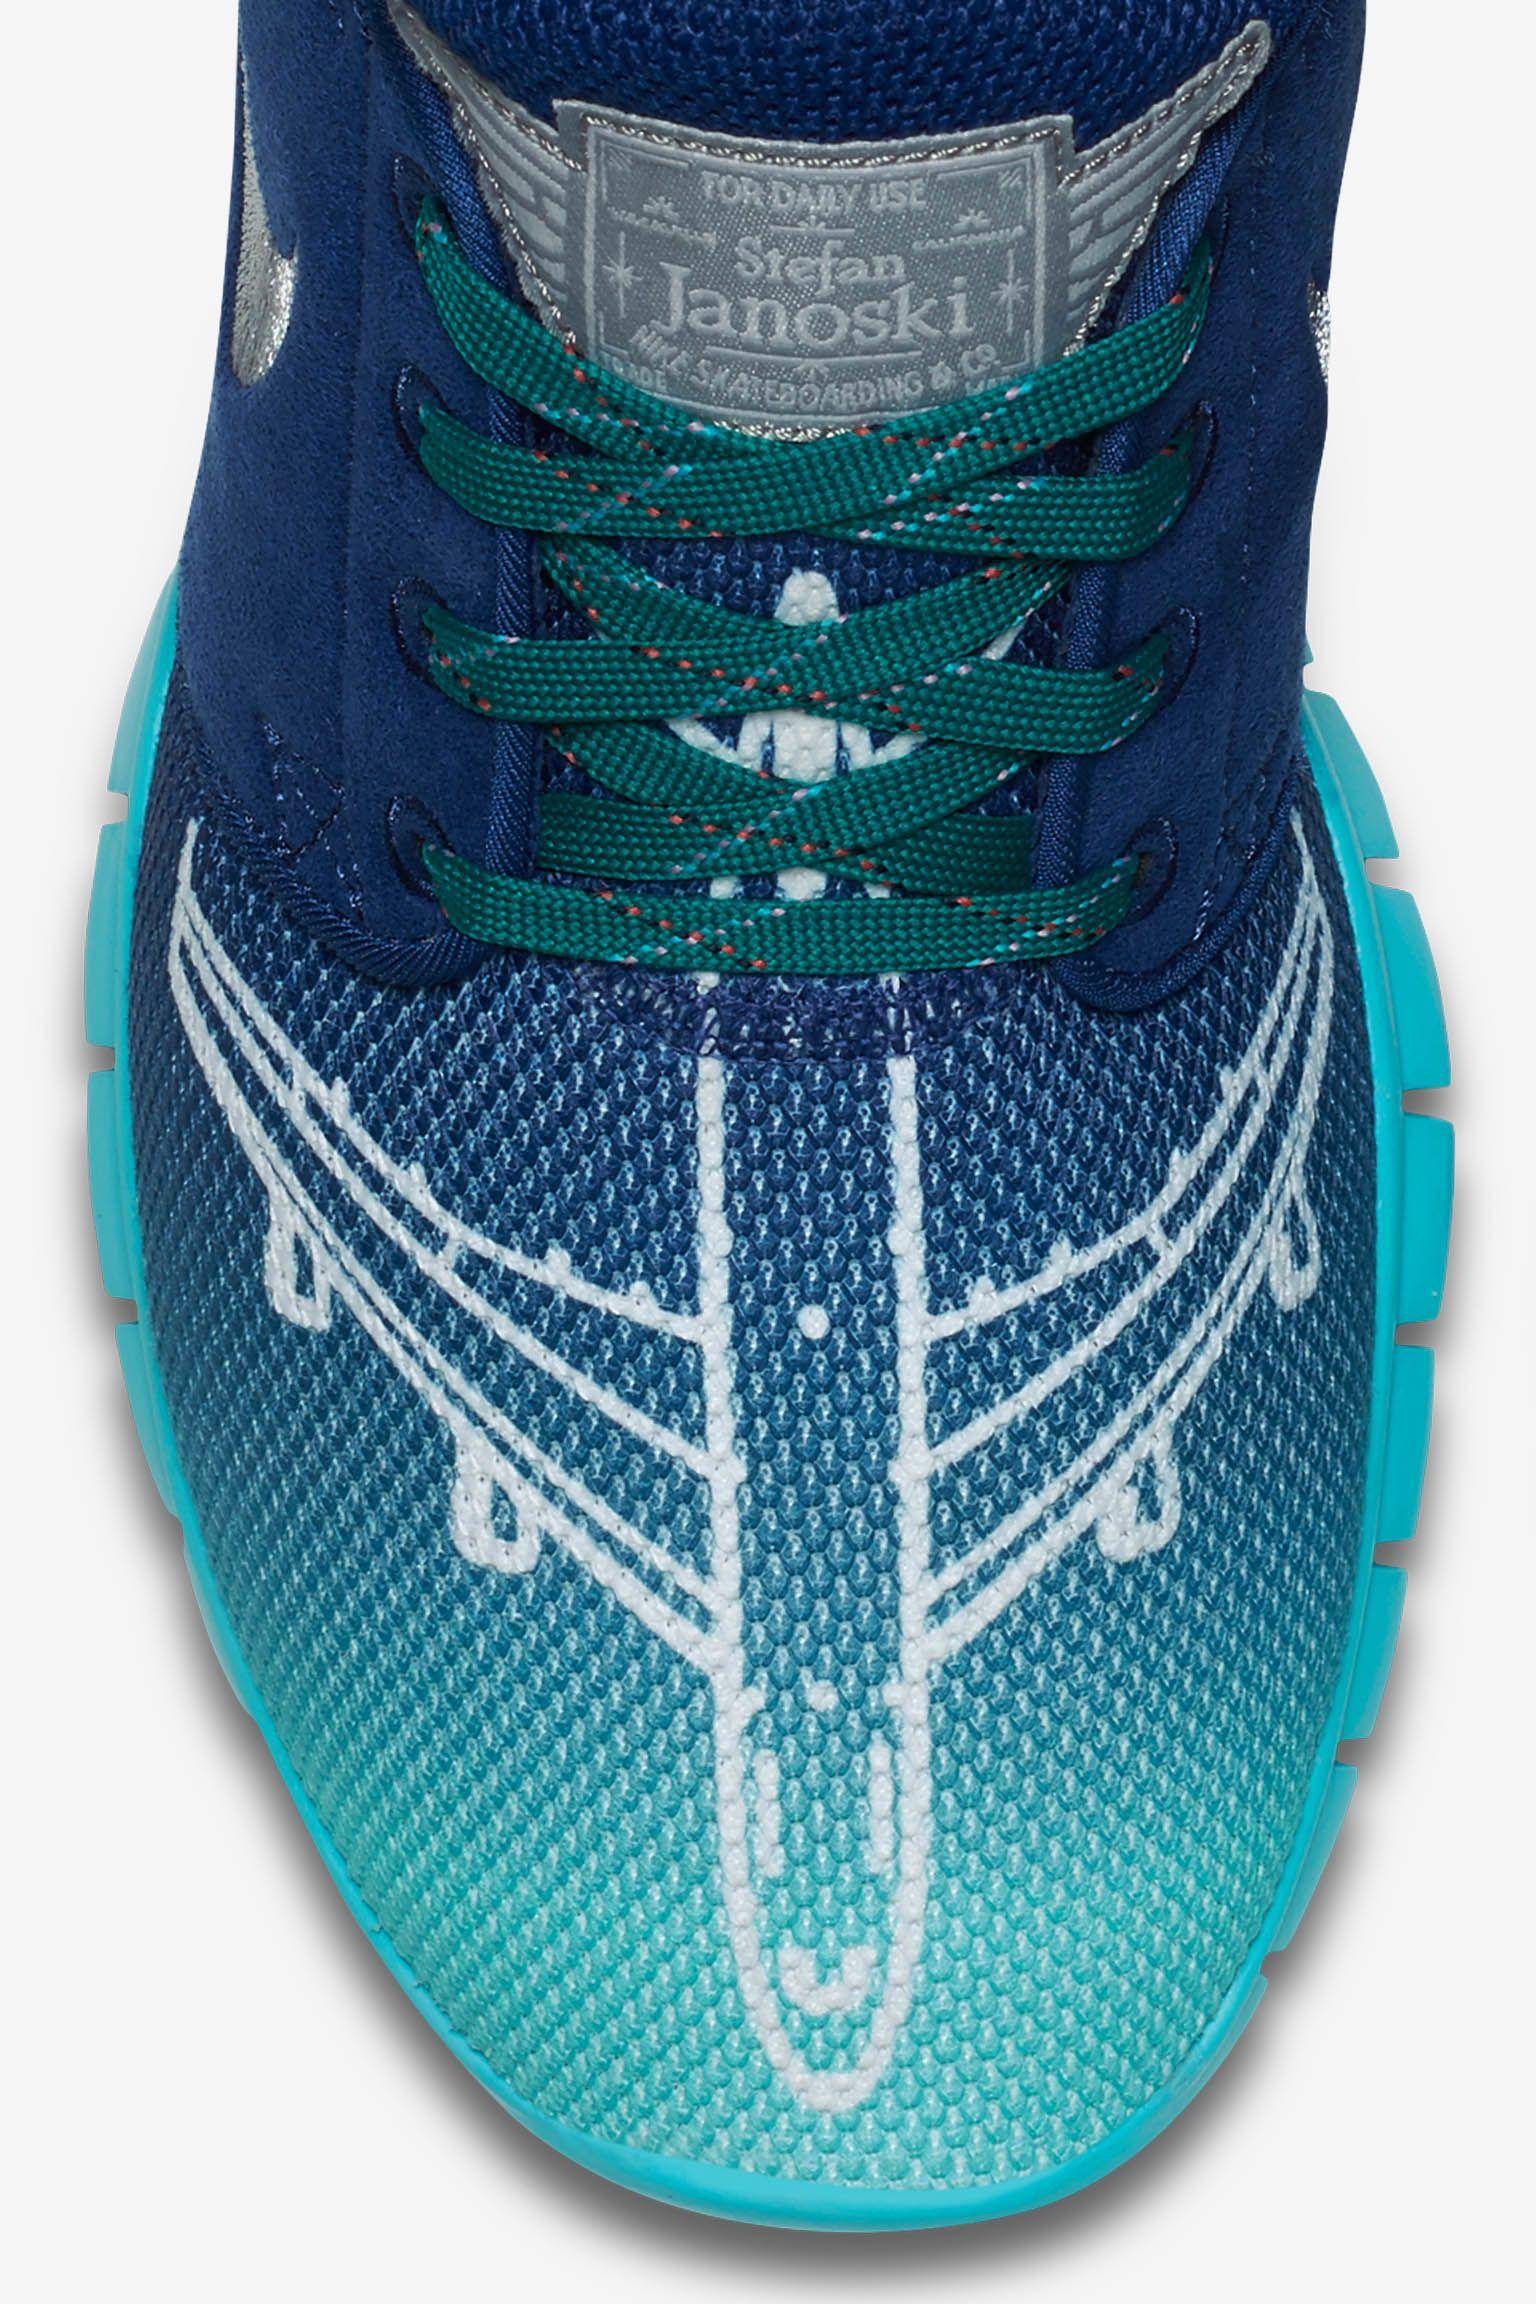 Nike Stefan Janoski Max Doernbecher 'Deep Royal Blue' Release Date